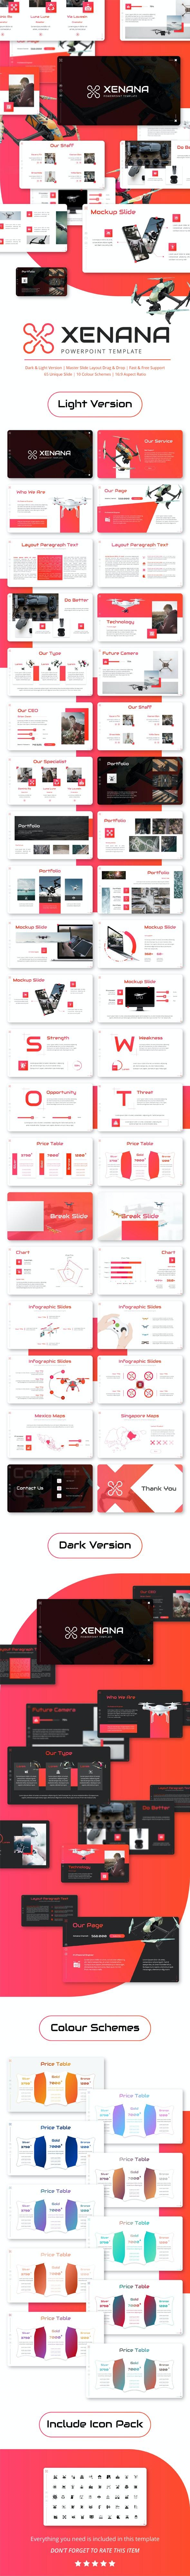 Xenana Presentation Template - PowerPoint Templates Presentation Templates